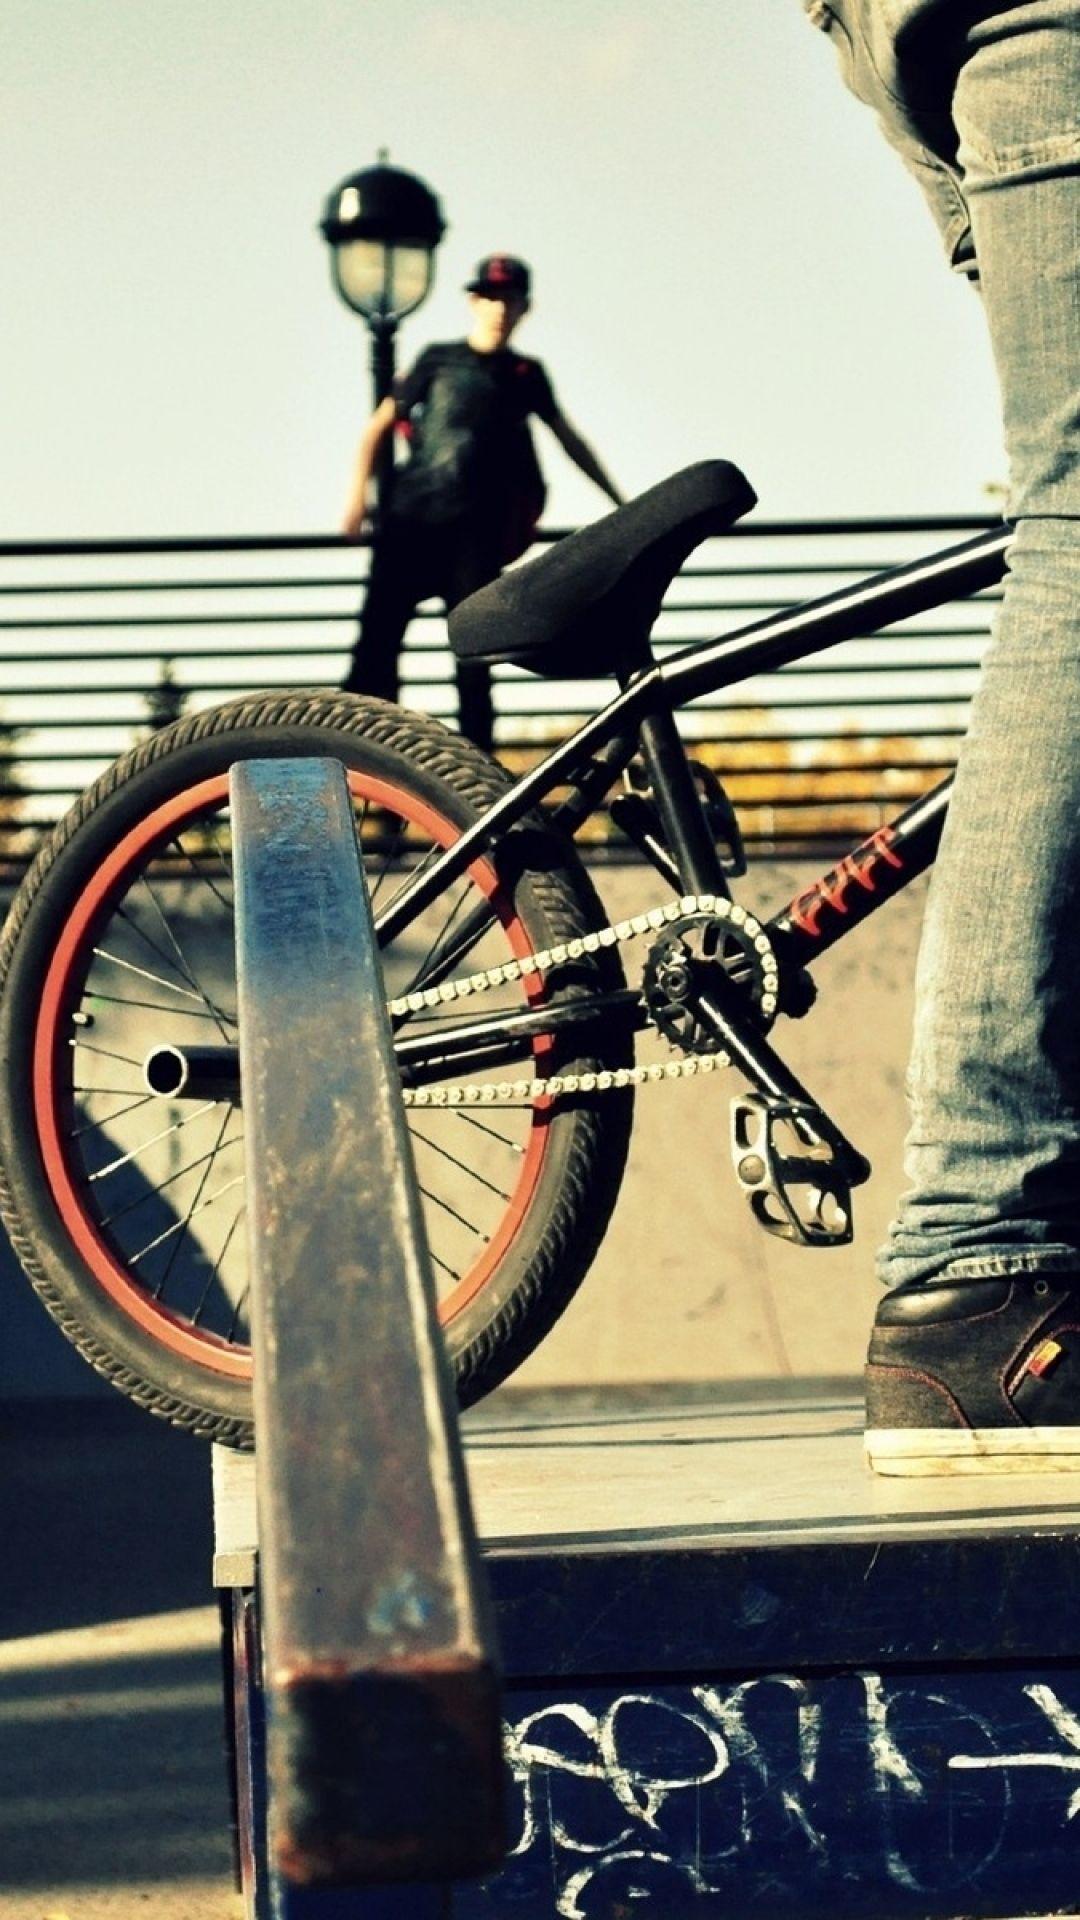 Download Wallpaper 1080x1920 Sports People Bmx Bike Sony Xperia Bike Drawing Bmx Bmx Bikes